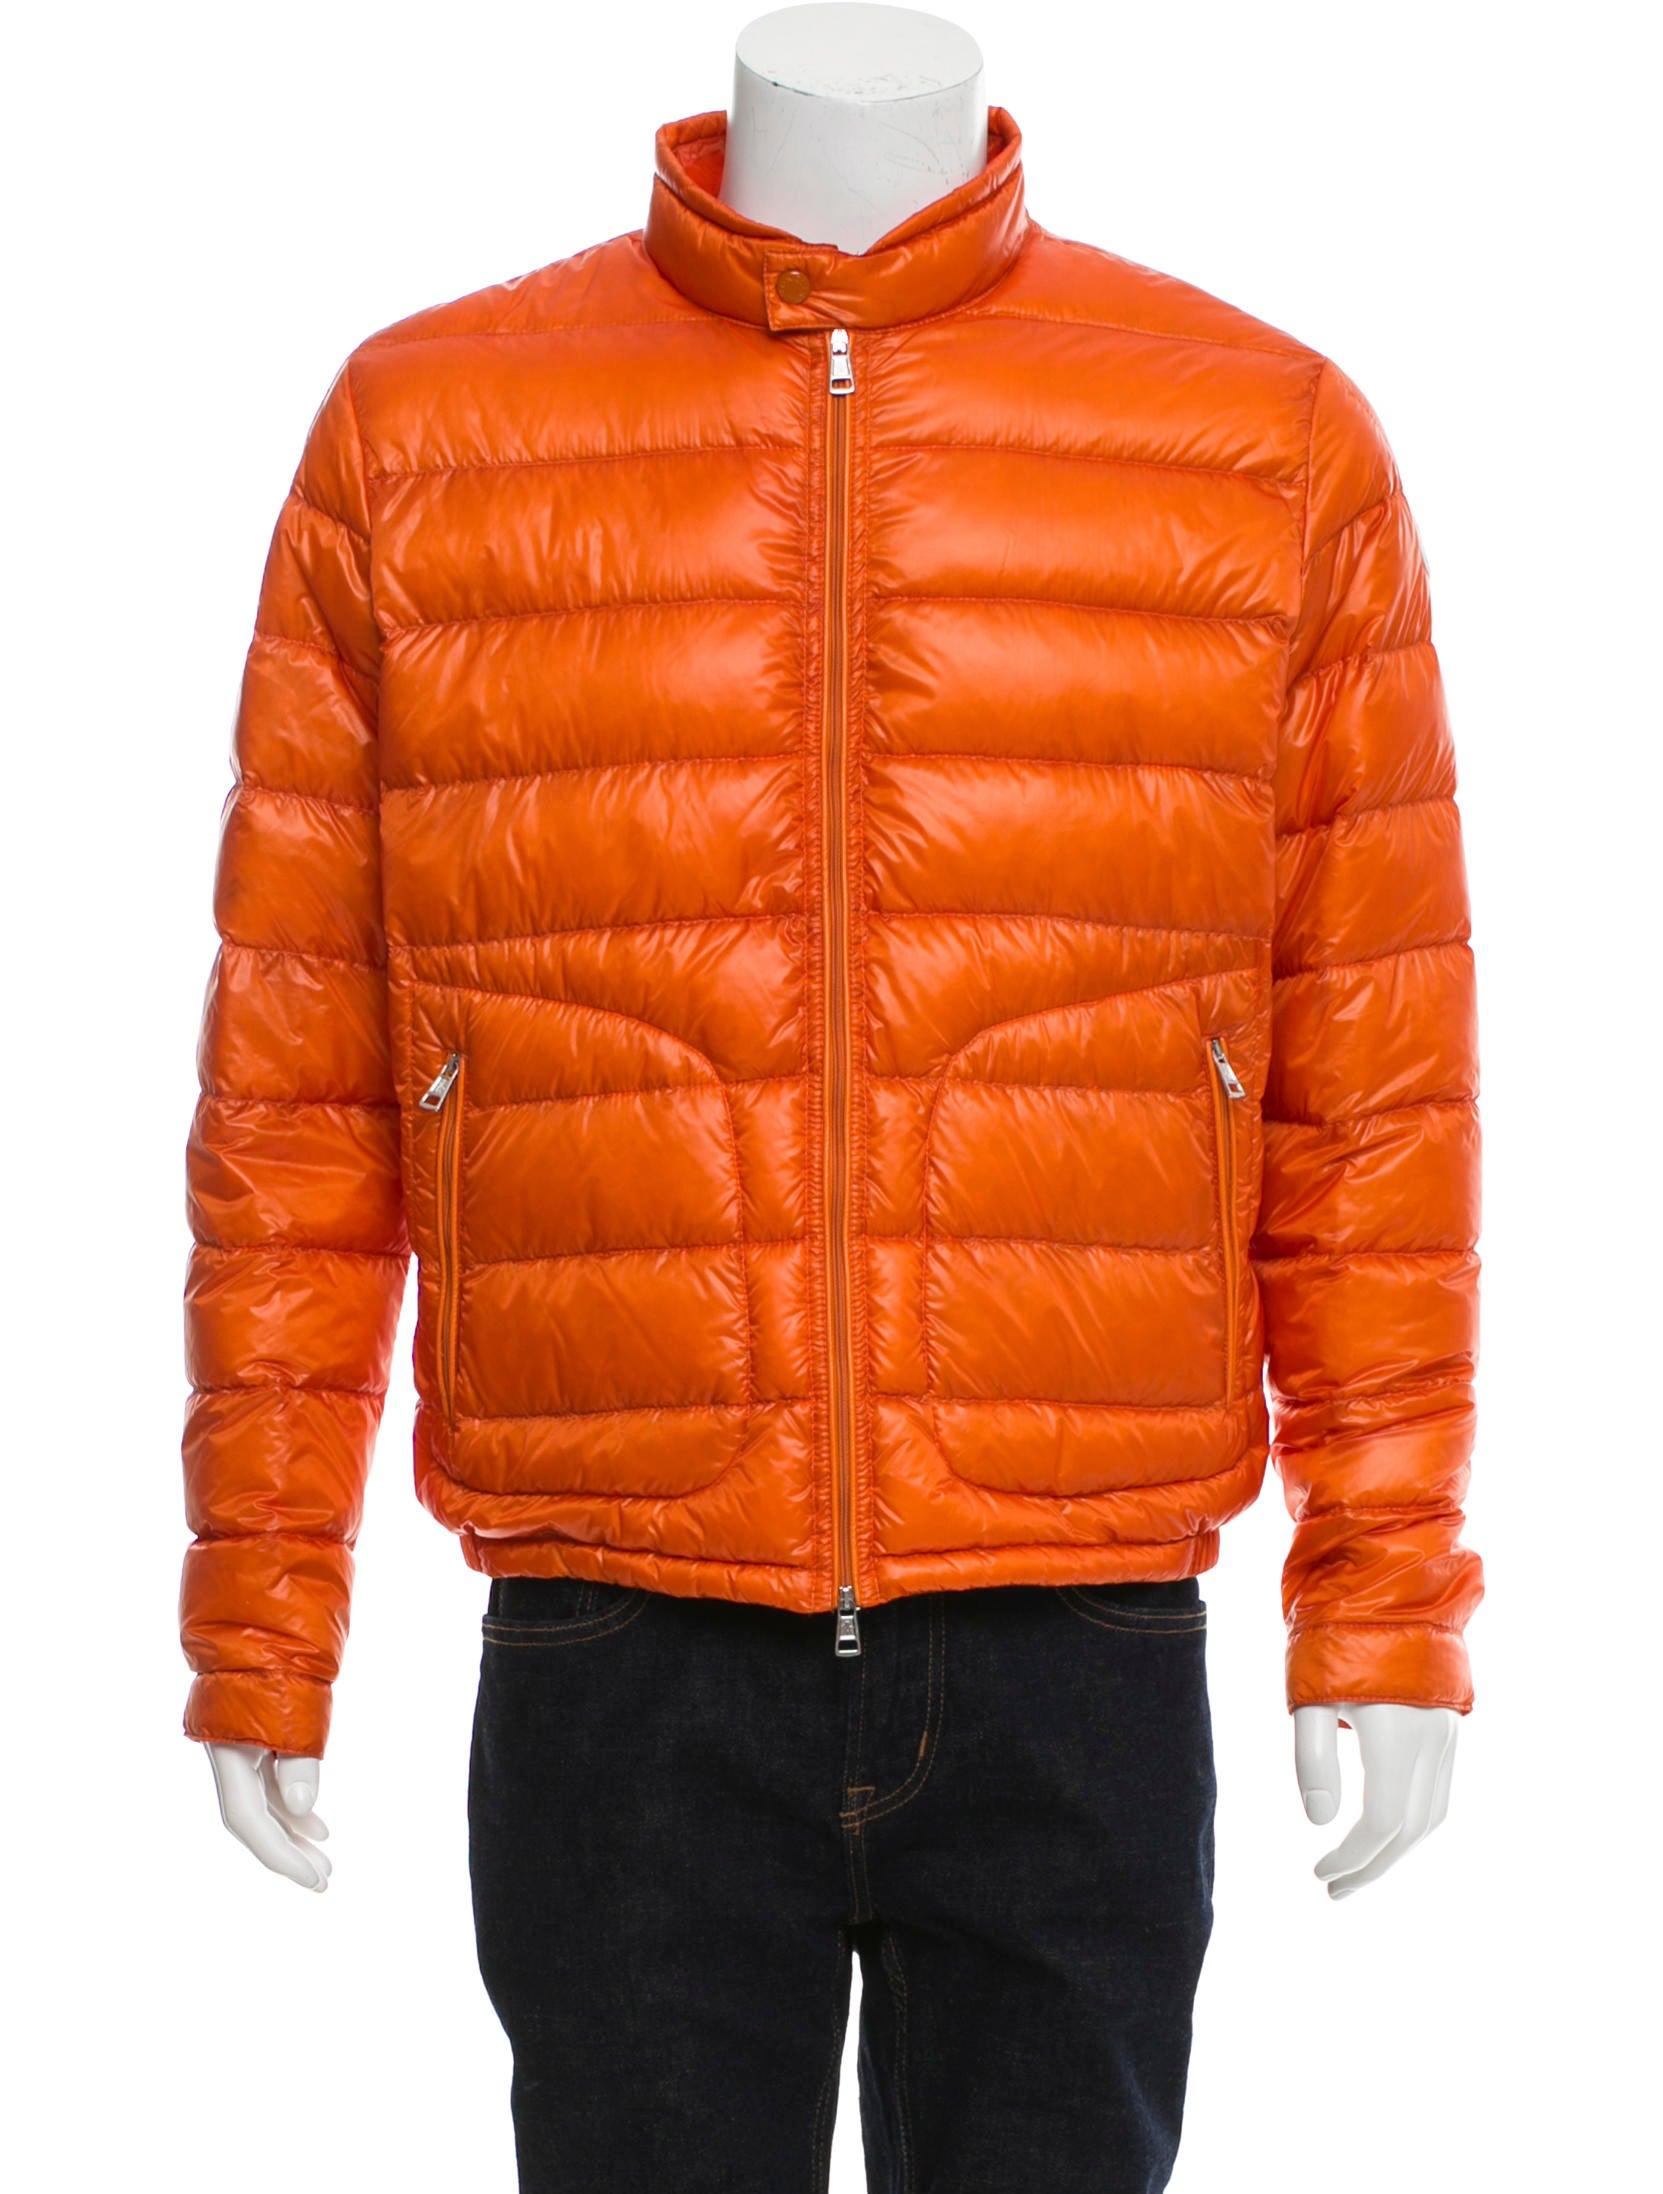 Acorus Down Jacket